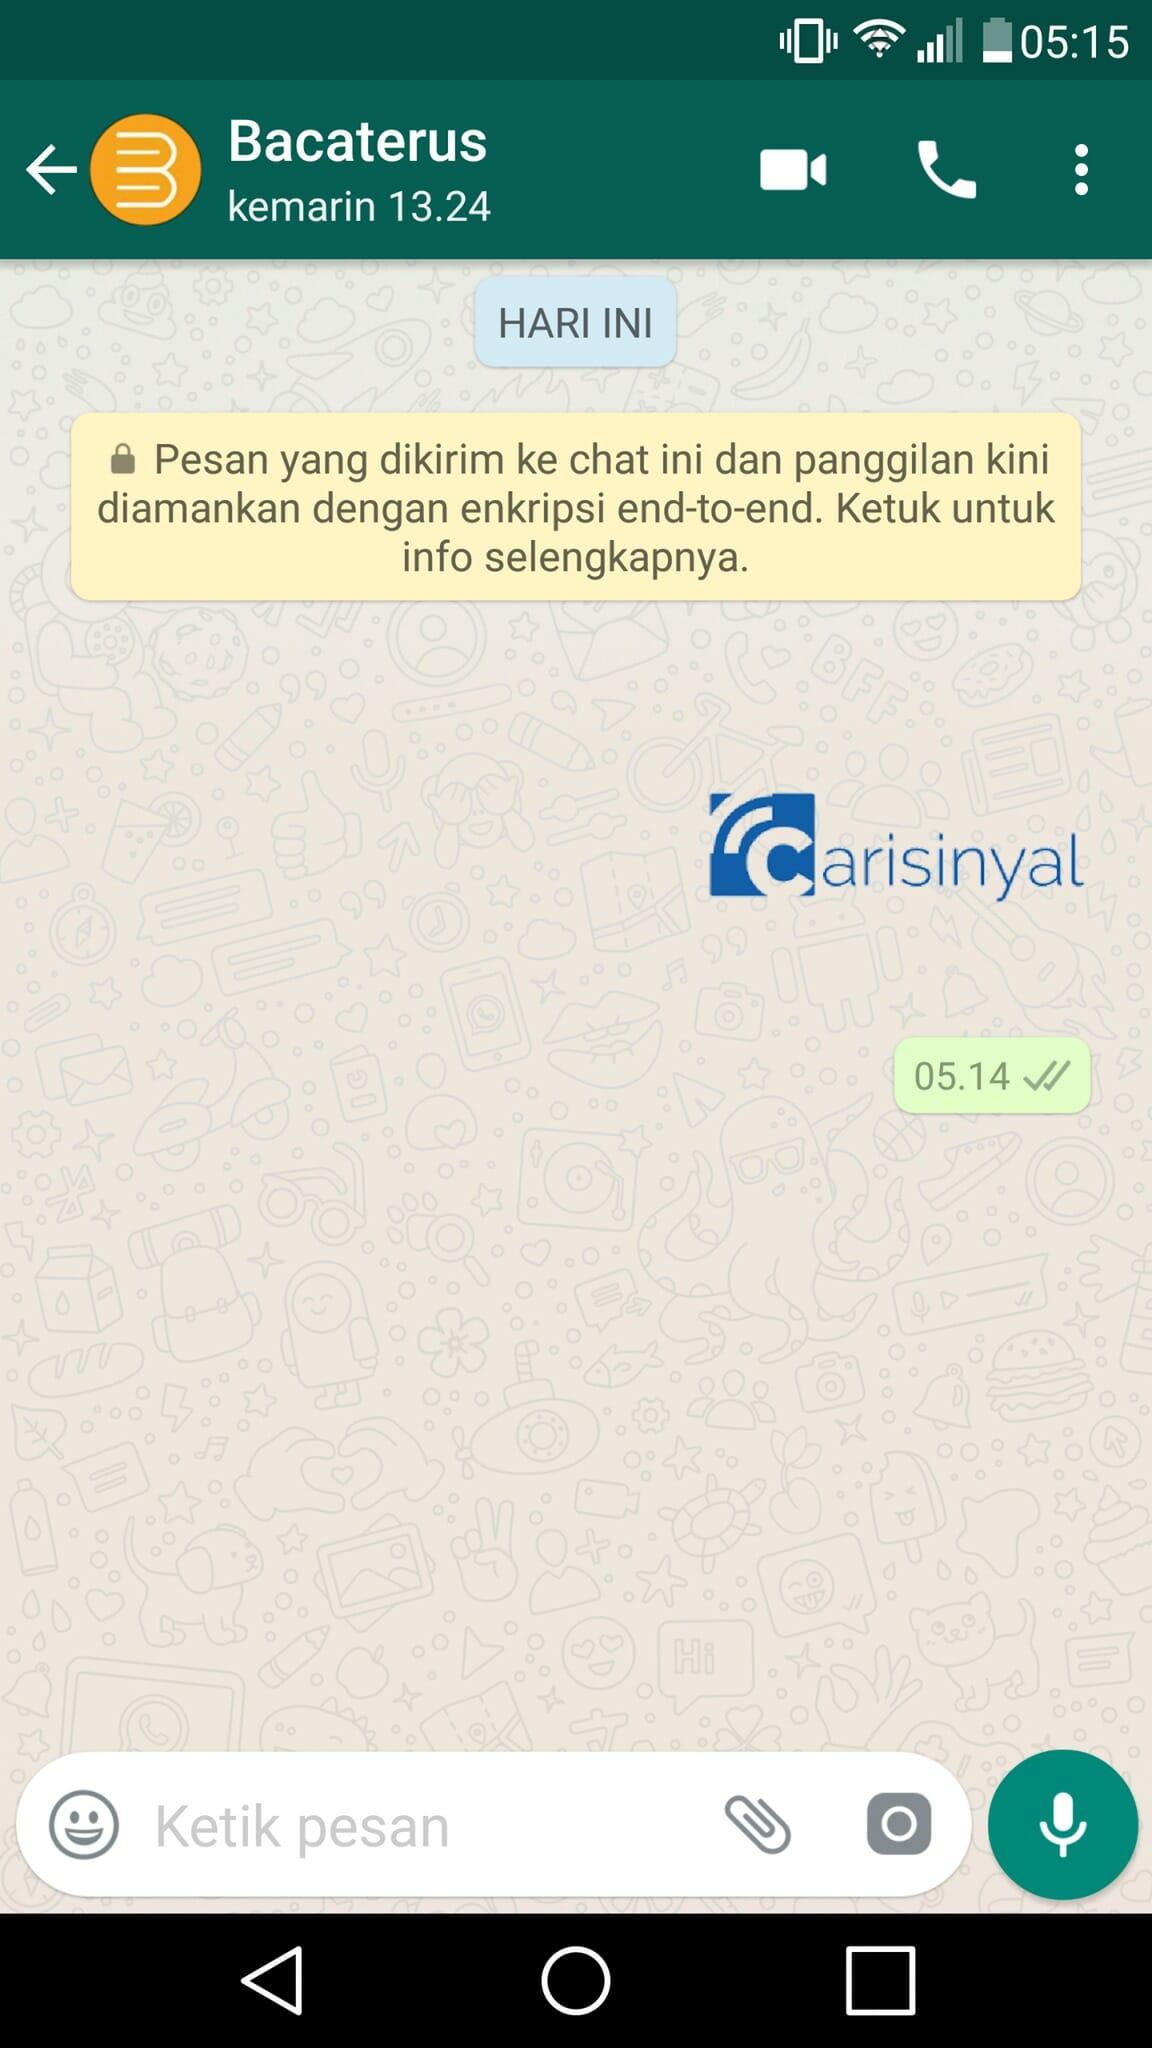 sticker logo carisinyal whatsapp